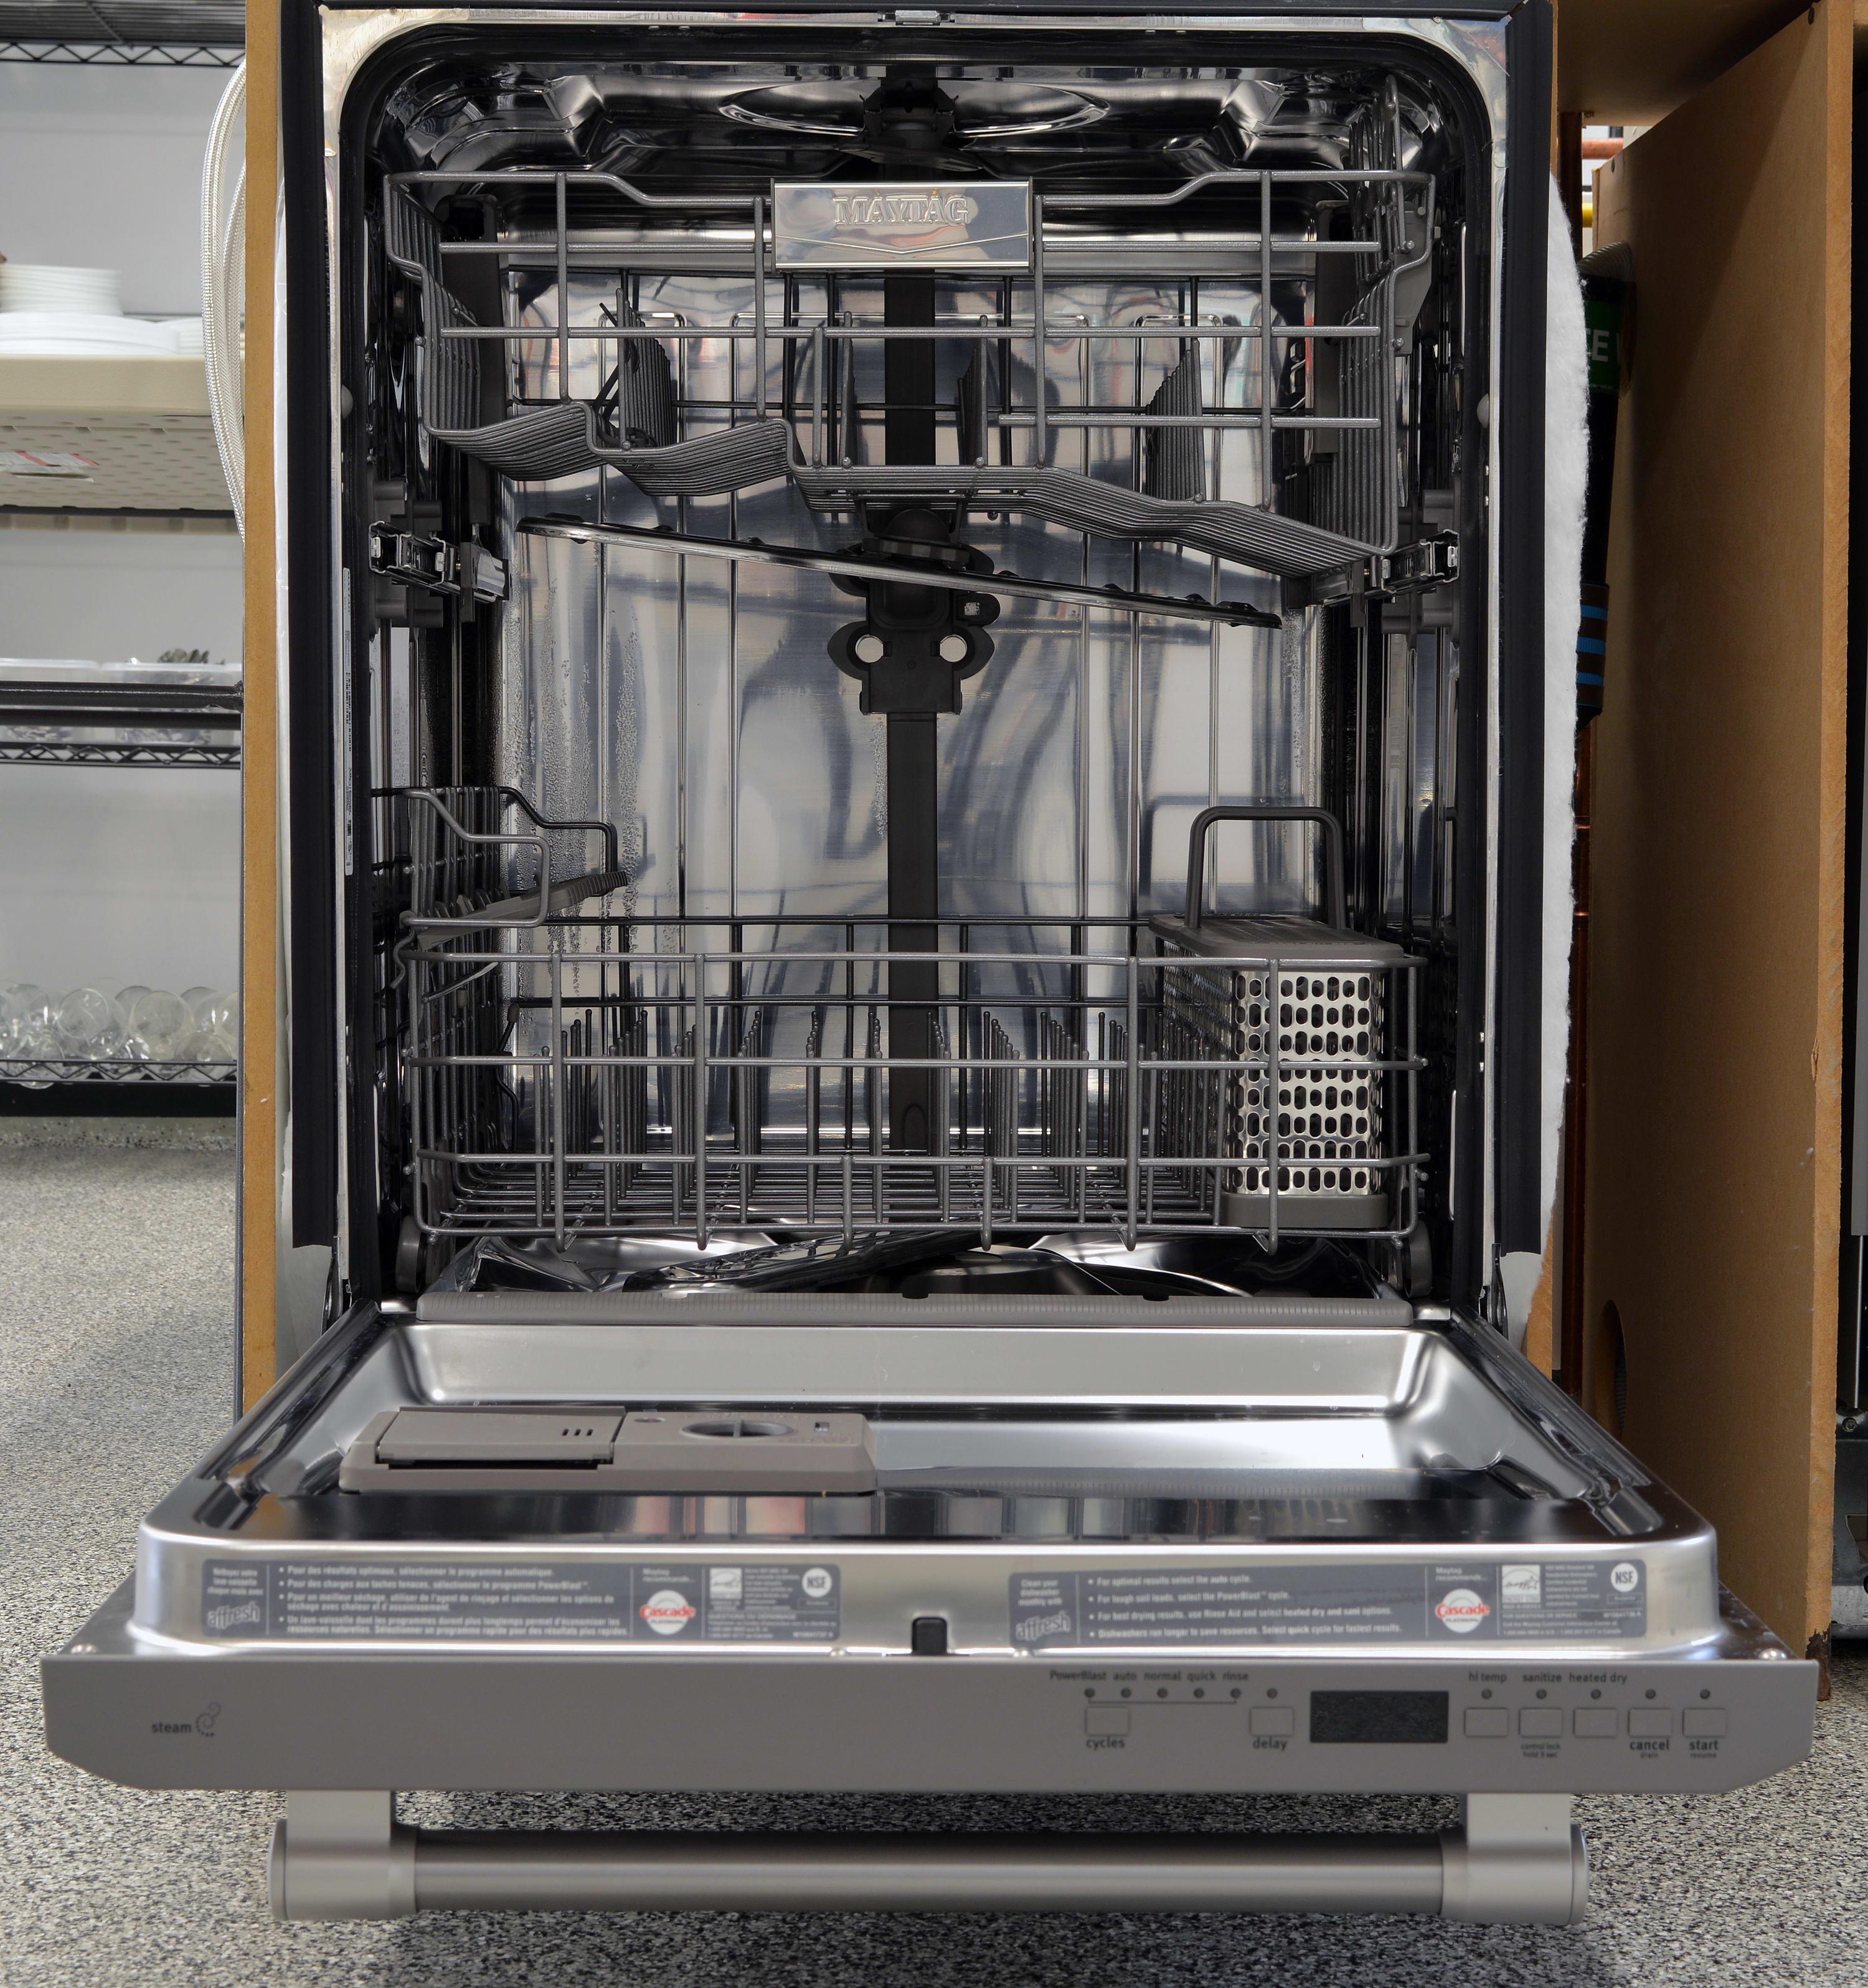 Maytag mdb8969sdm dishwasher review dishwashers for White dishwasher with stainless steel interior